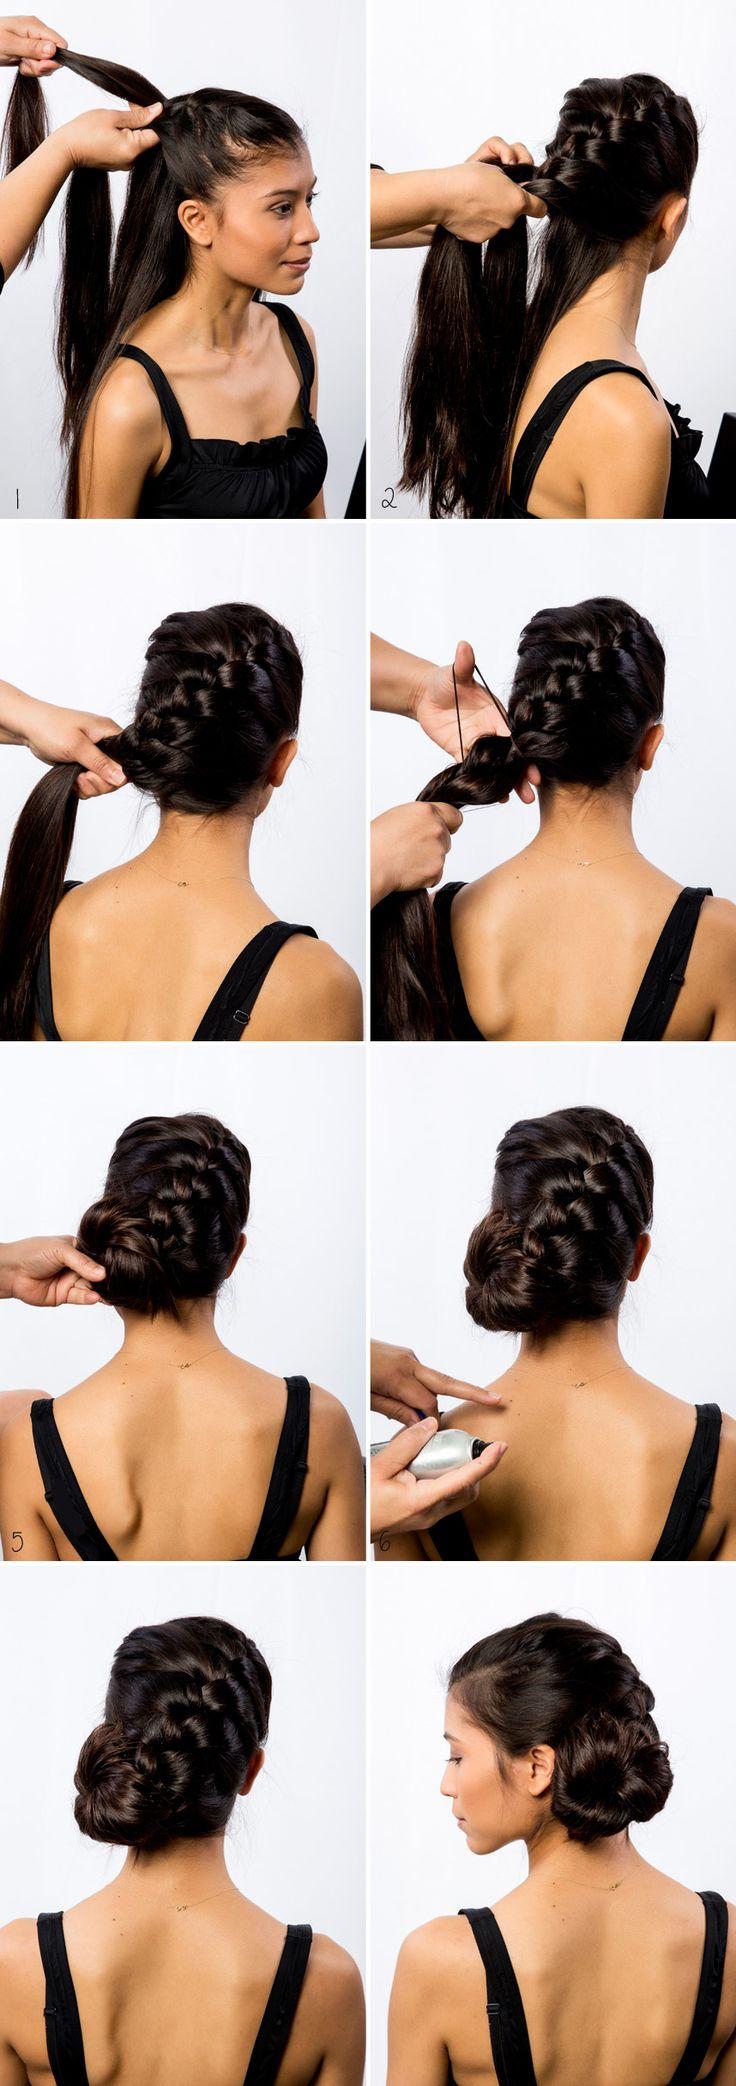 Side Bun Braid Hair Tutorial - Stylishlyme